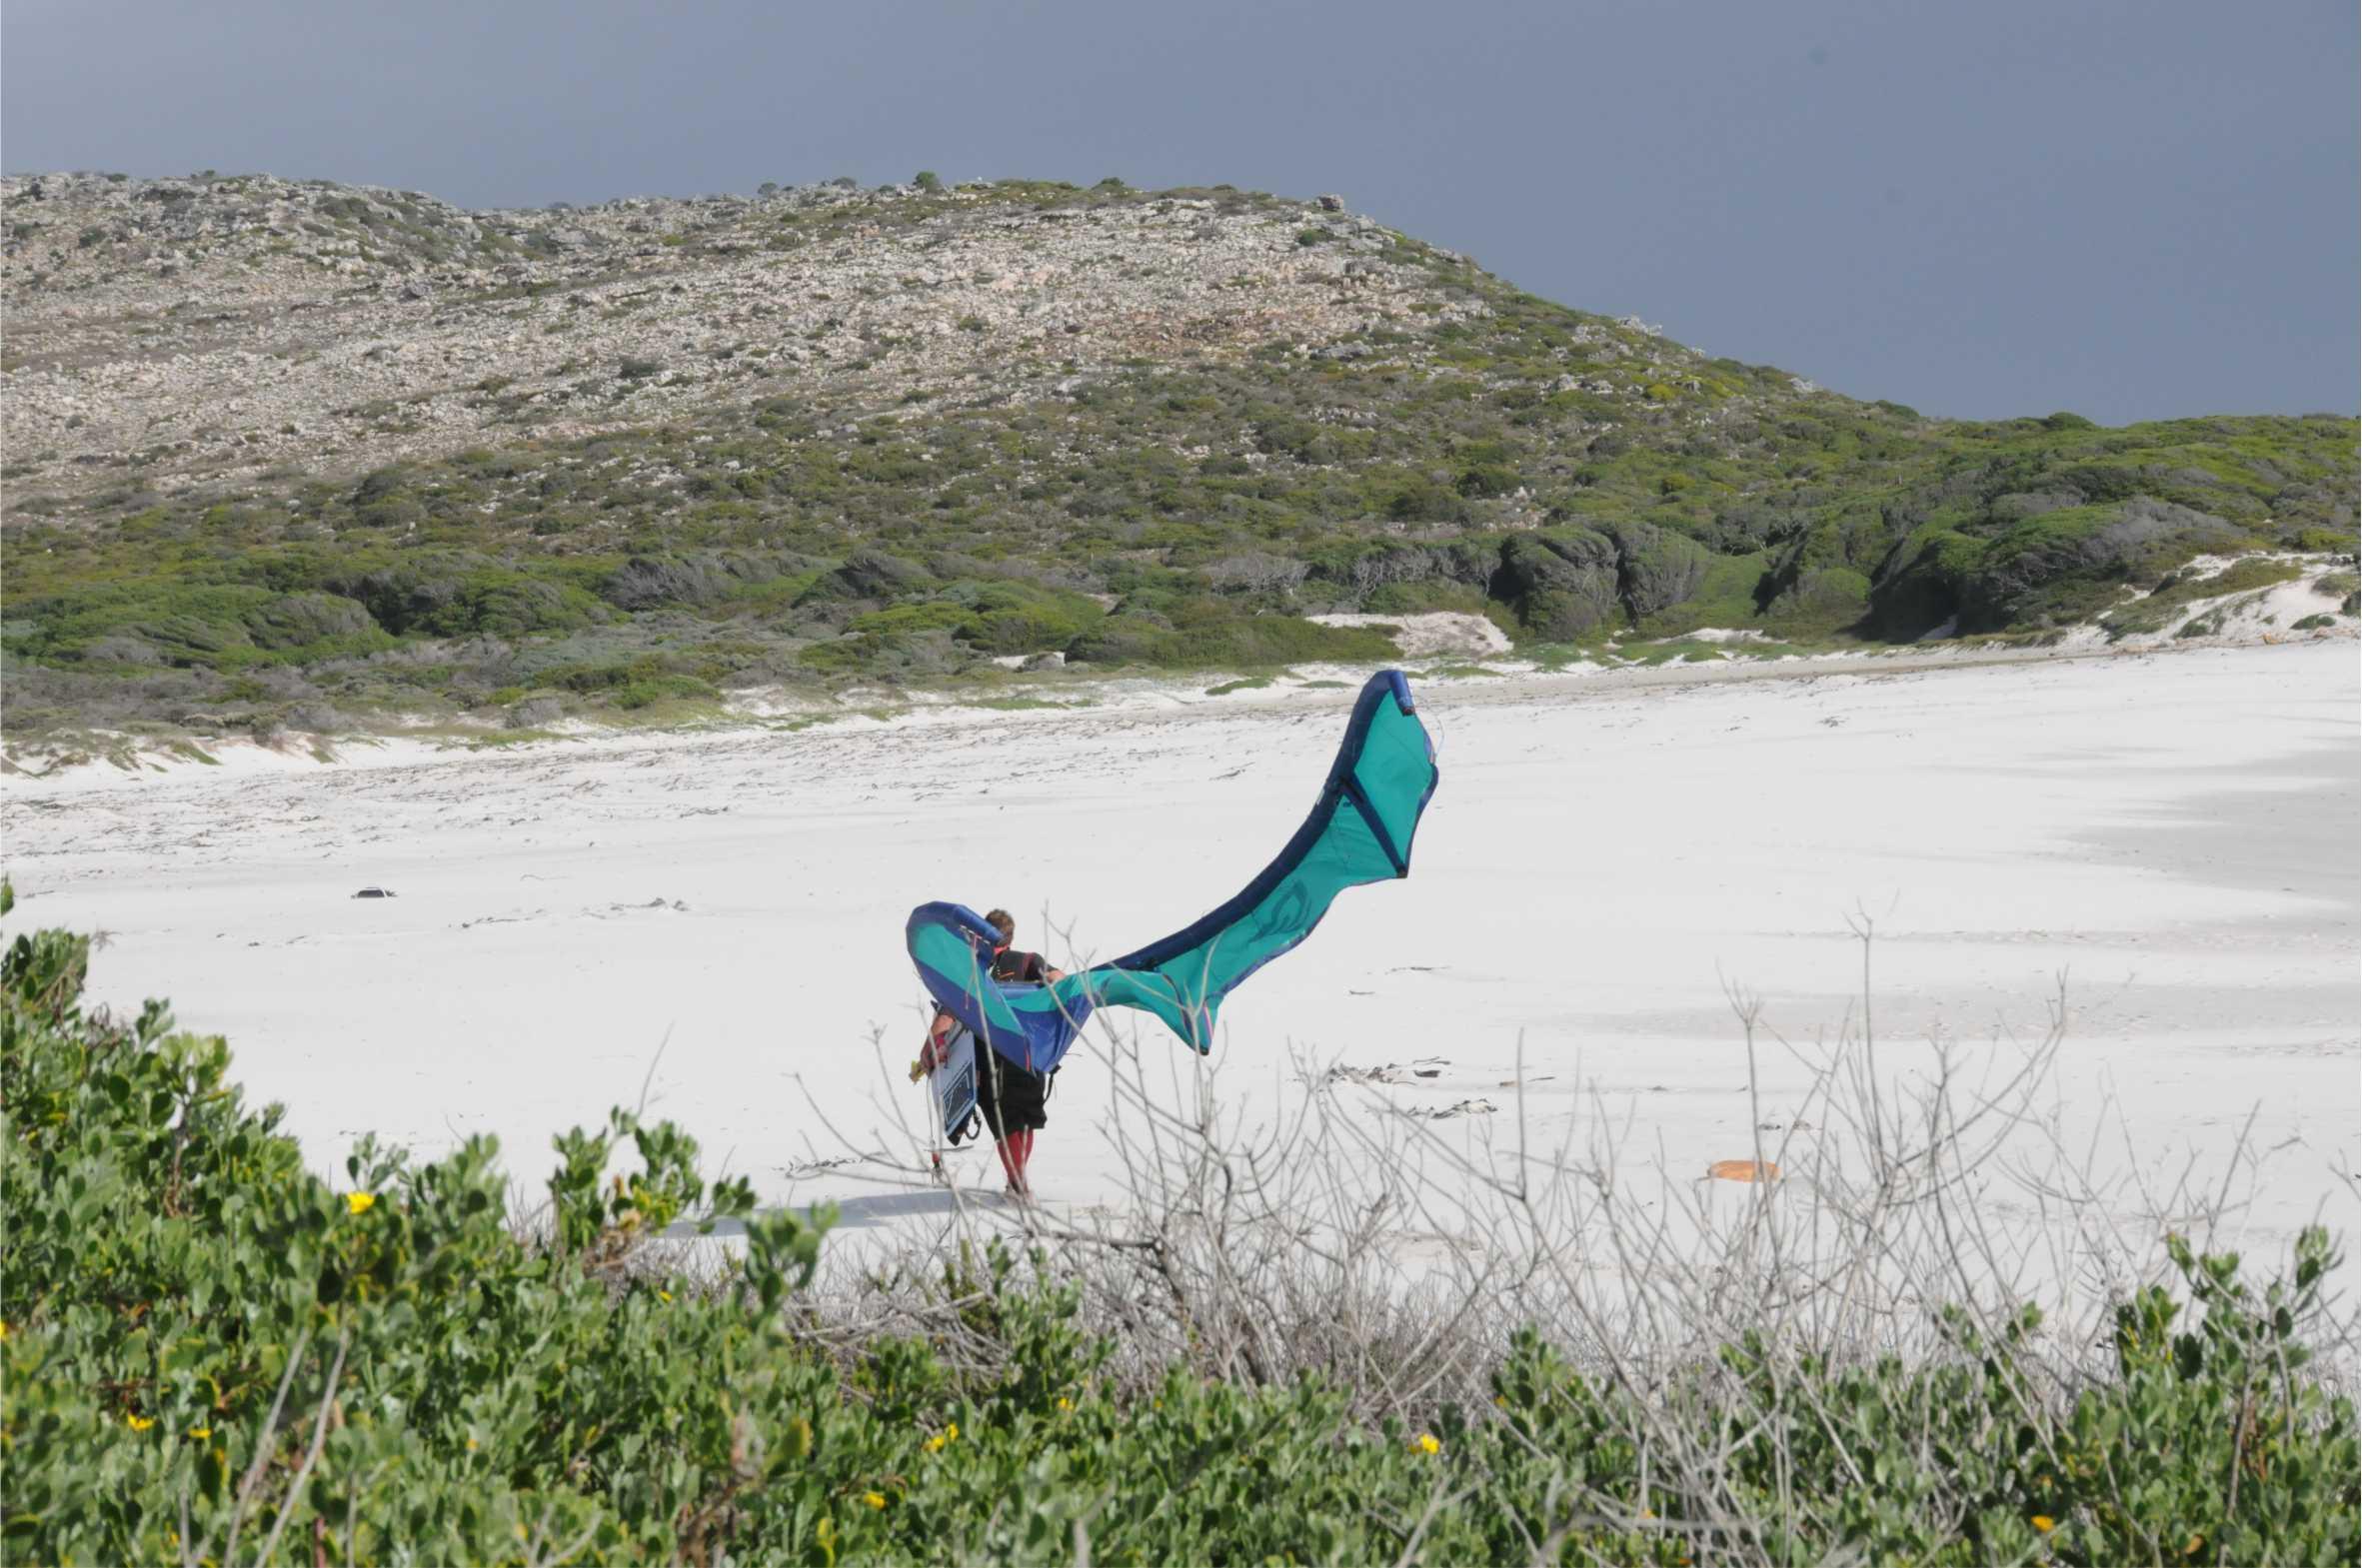 ullman kite life.jpg